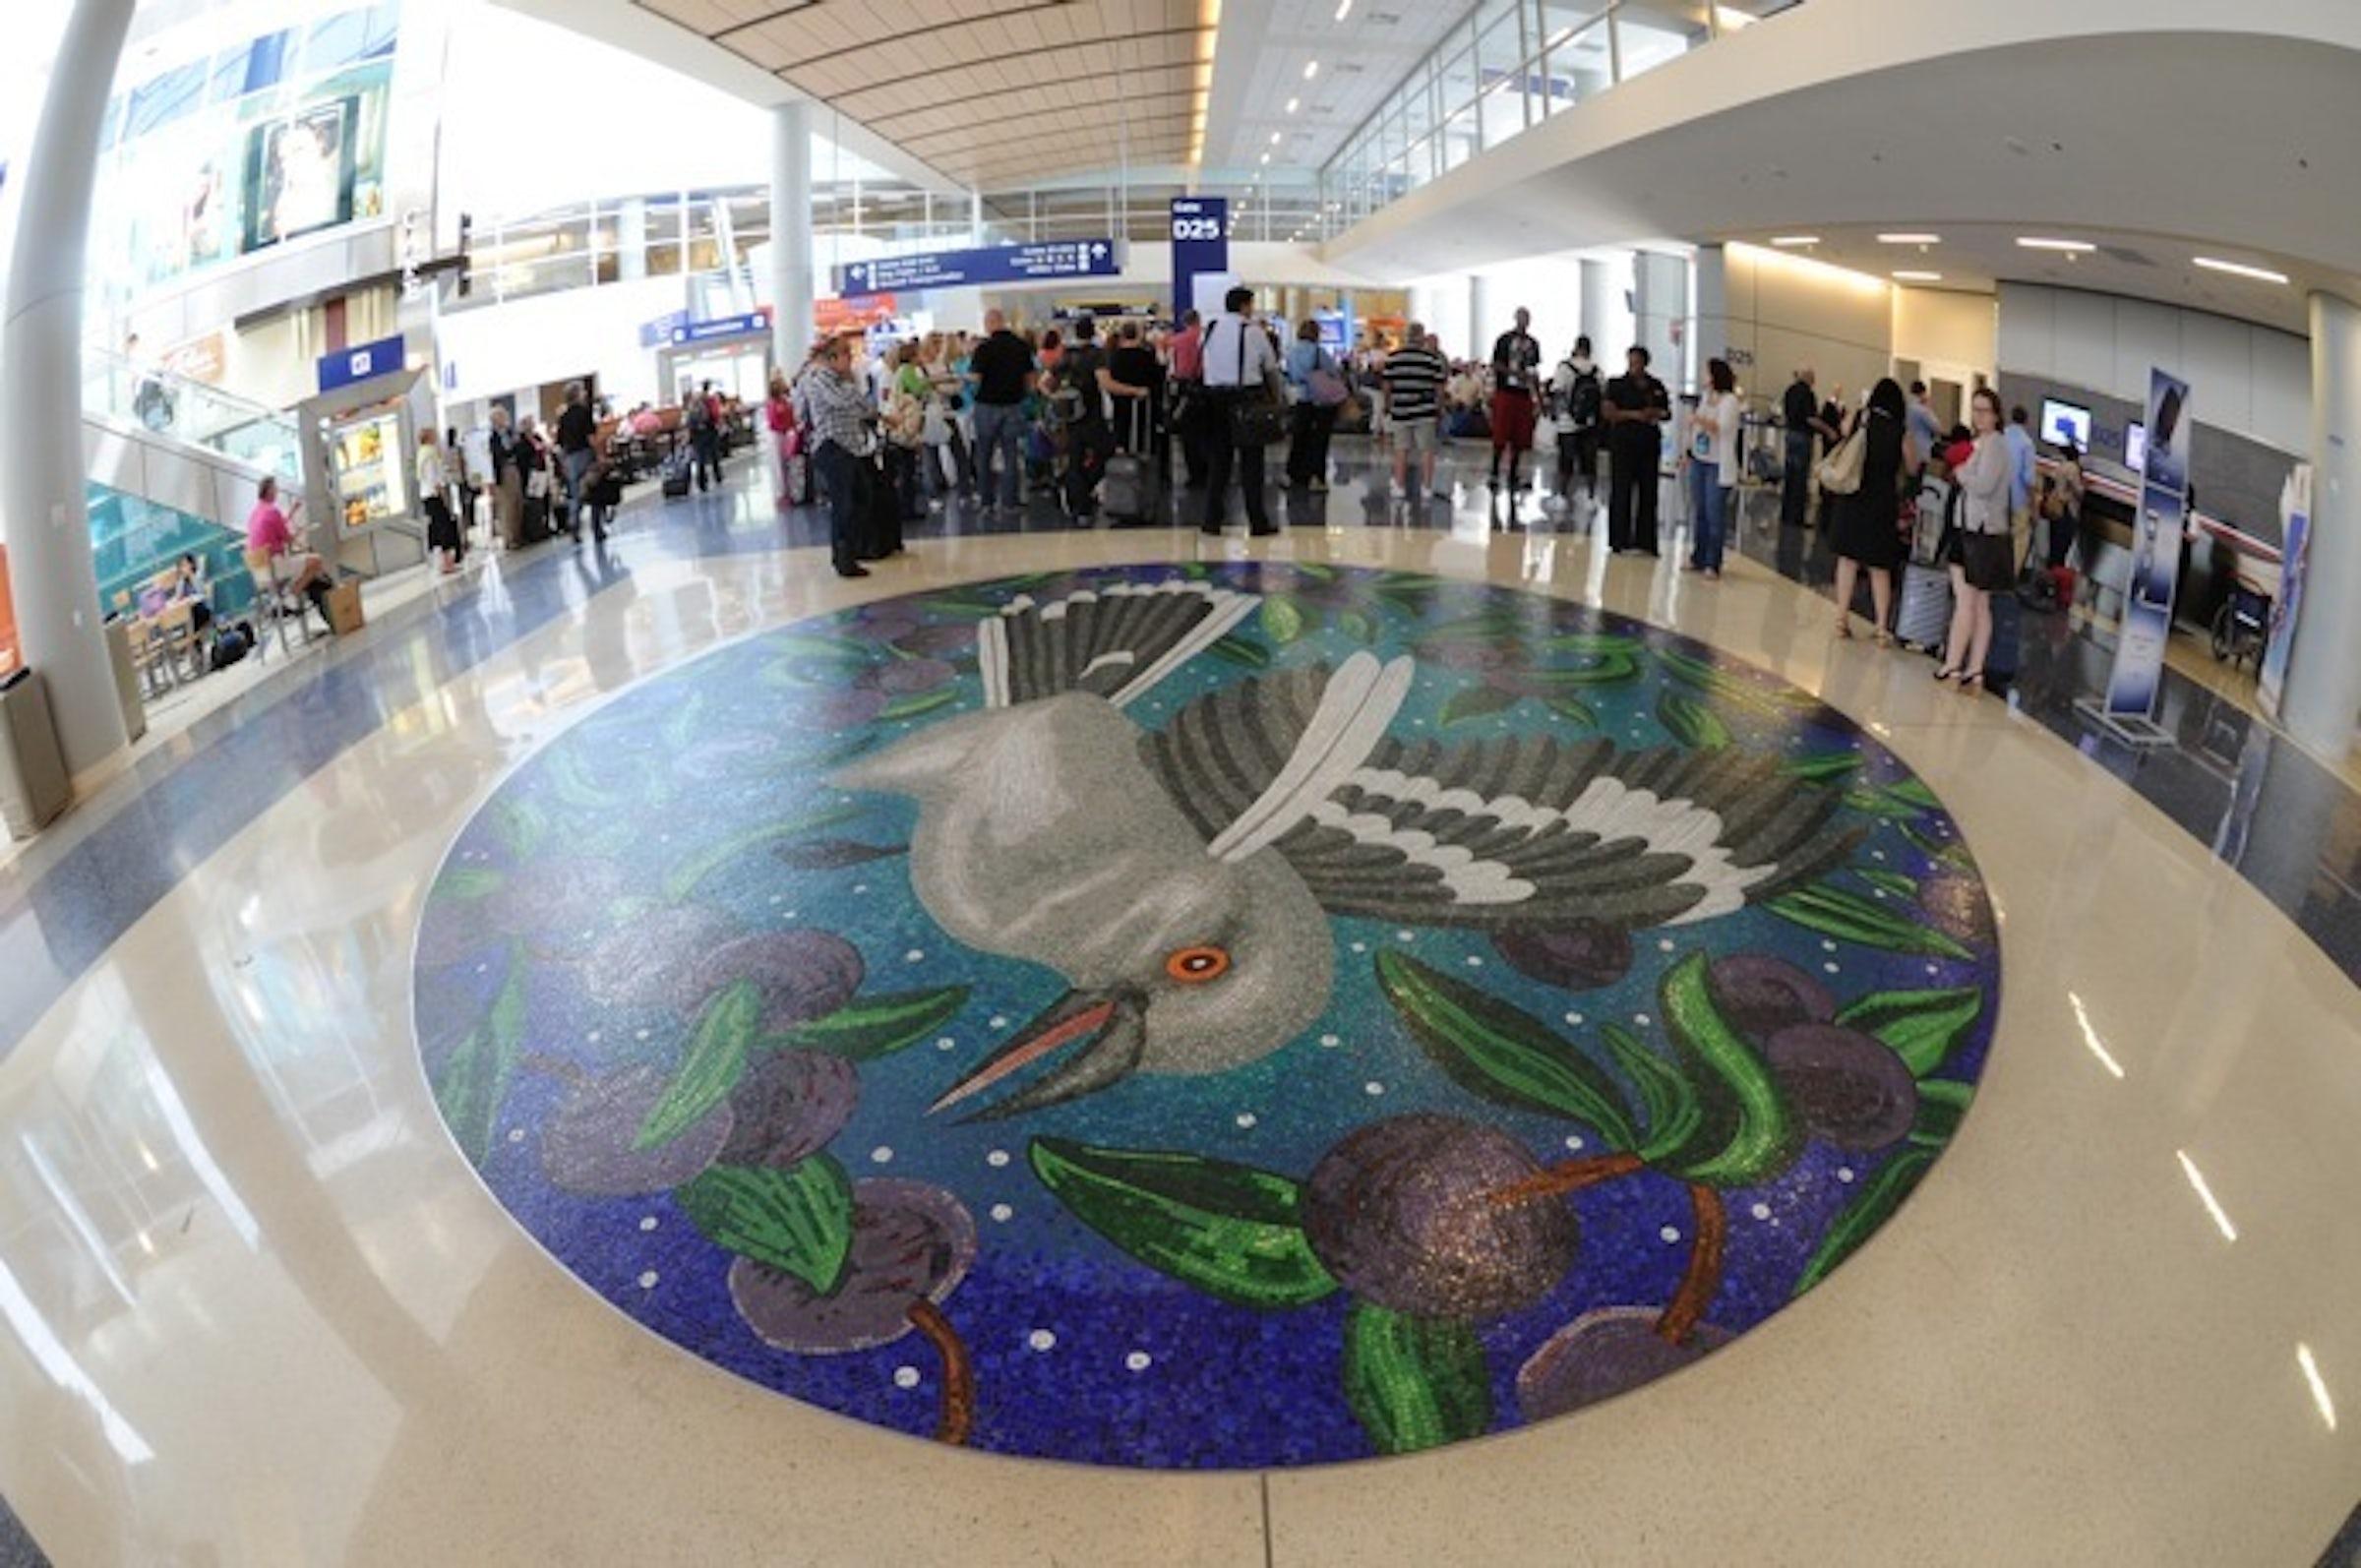 Dallas/Fort Worth International Airport in Beyond Dallas